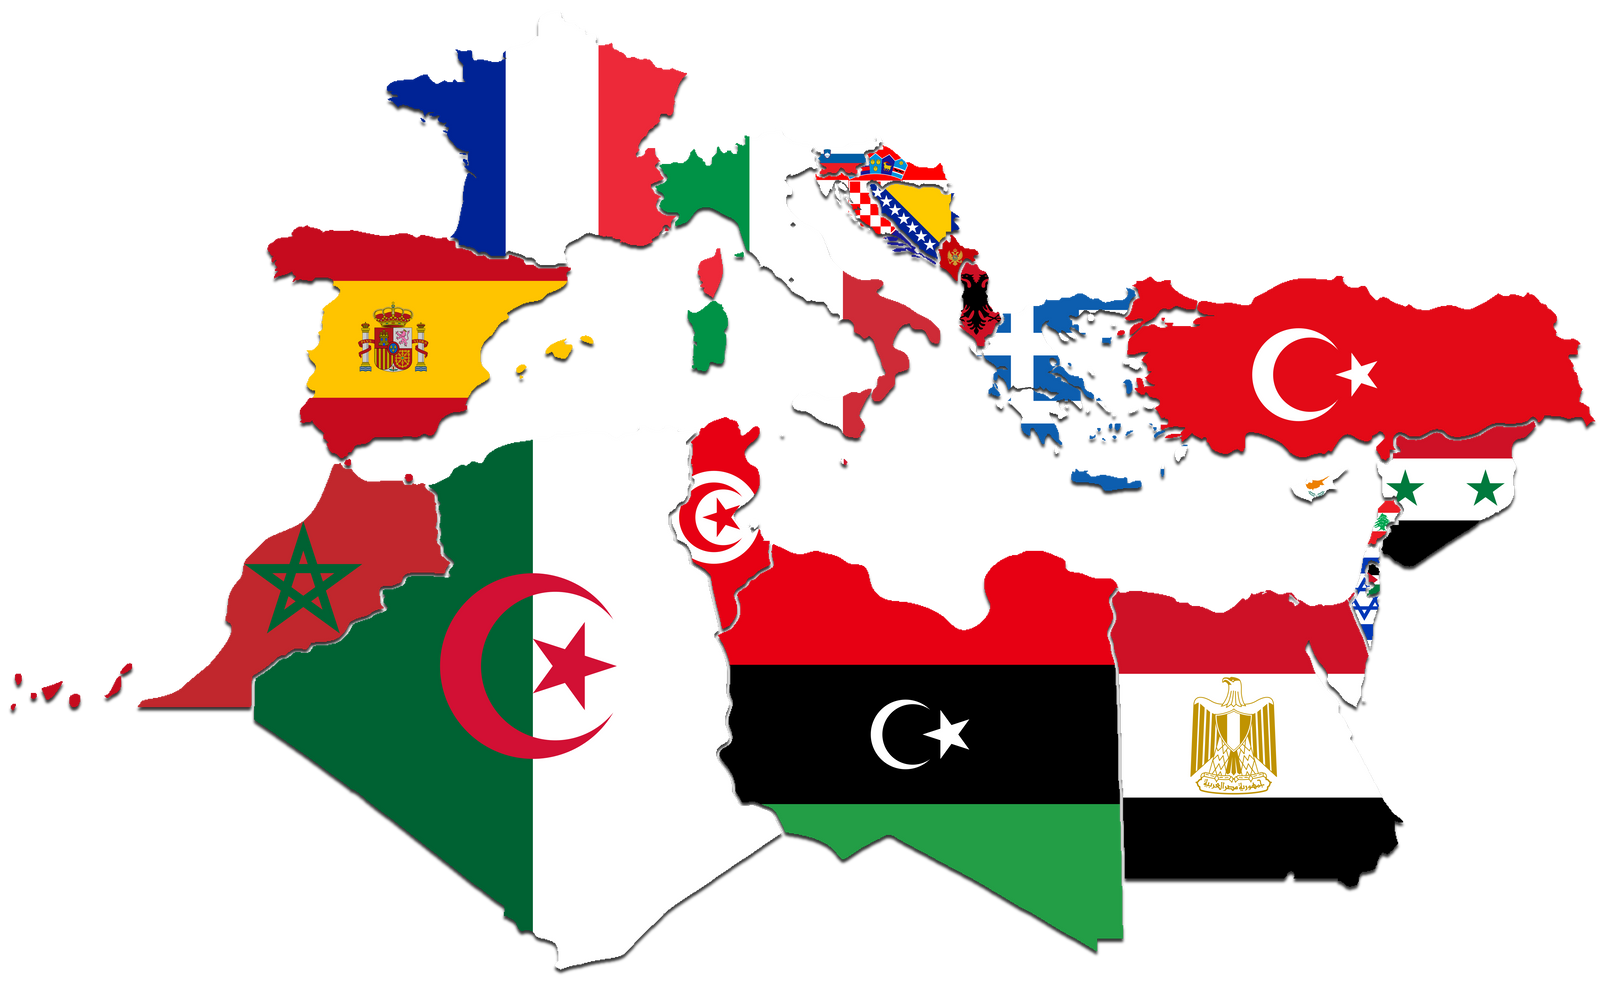 Mediterranean Countries FlagMap by CaptainVoda on DeviantArt